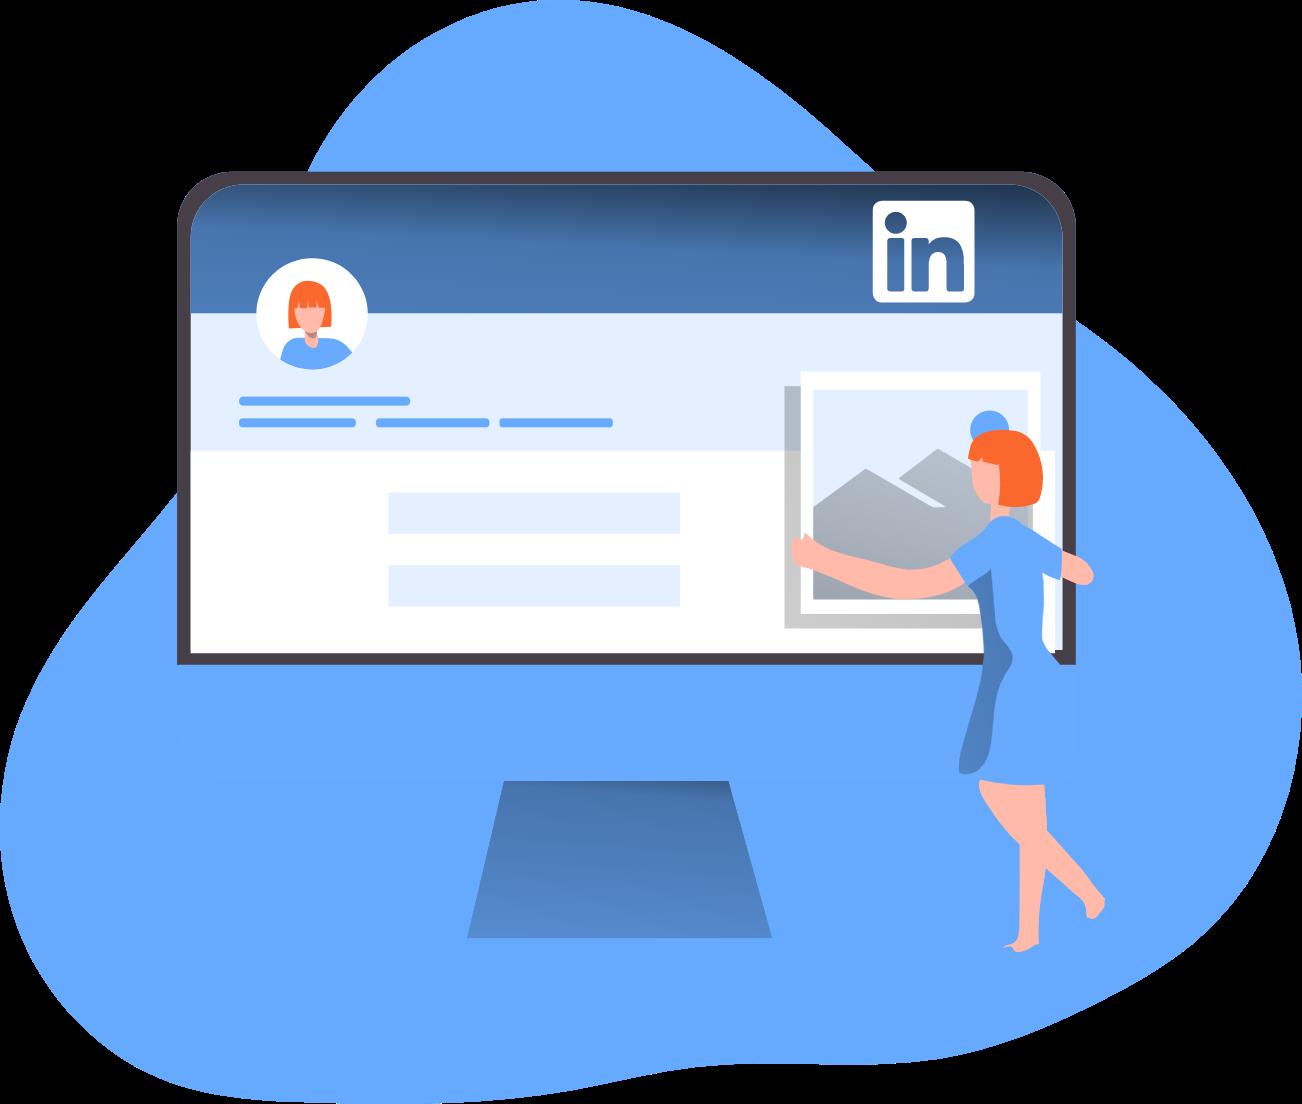 Image for part: Check your LinkedIn portfolio.